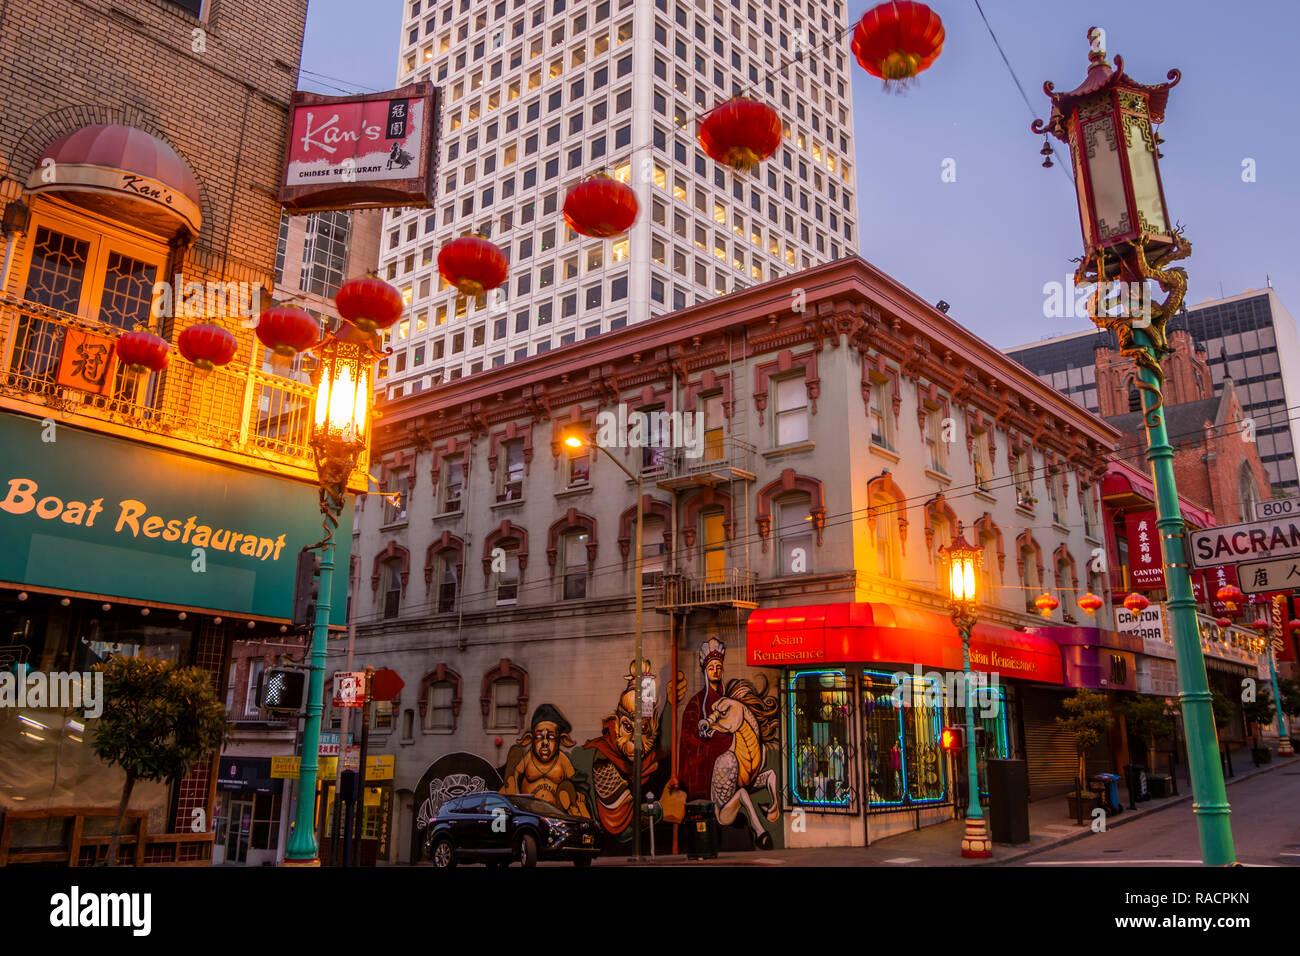 Chinatown San Francisco Restaurant Stock Photos Chinatown